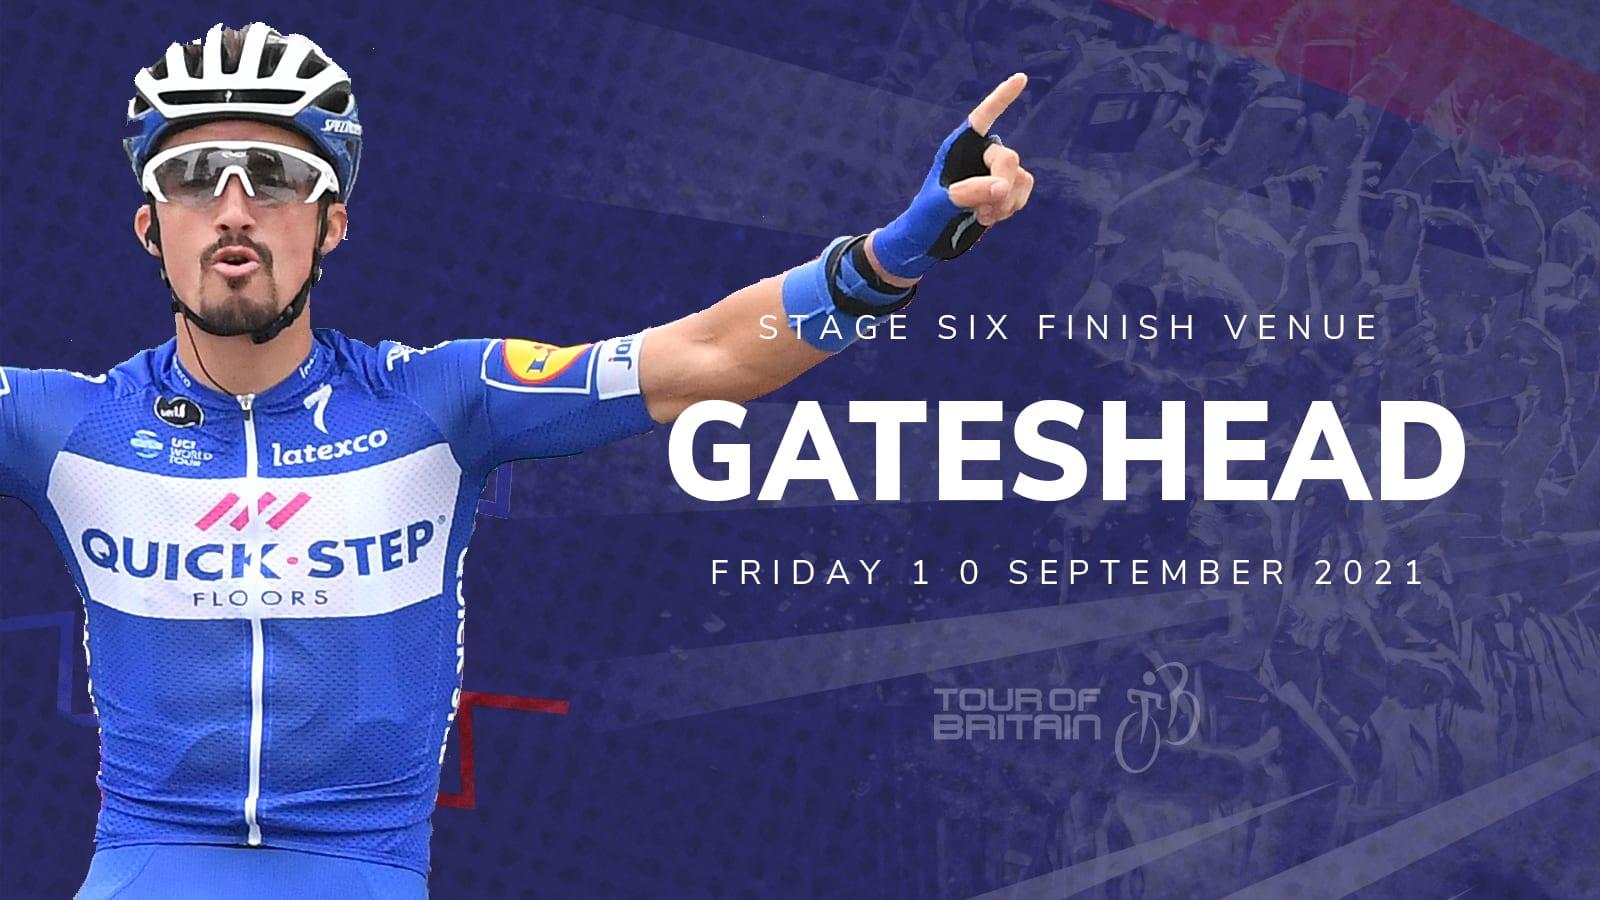 Tour of Britain Gateshead 2021